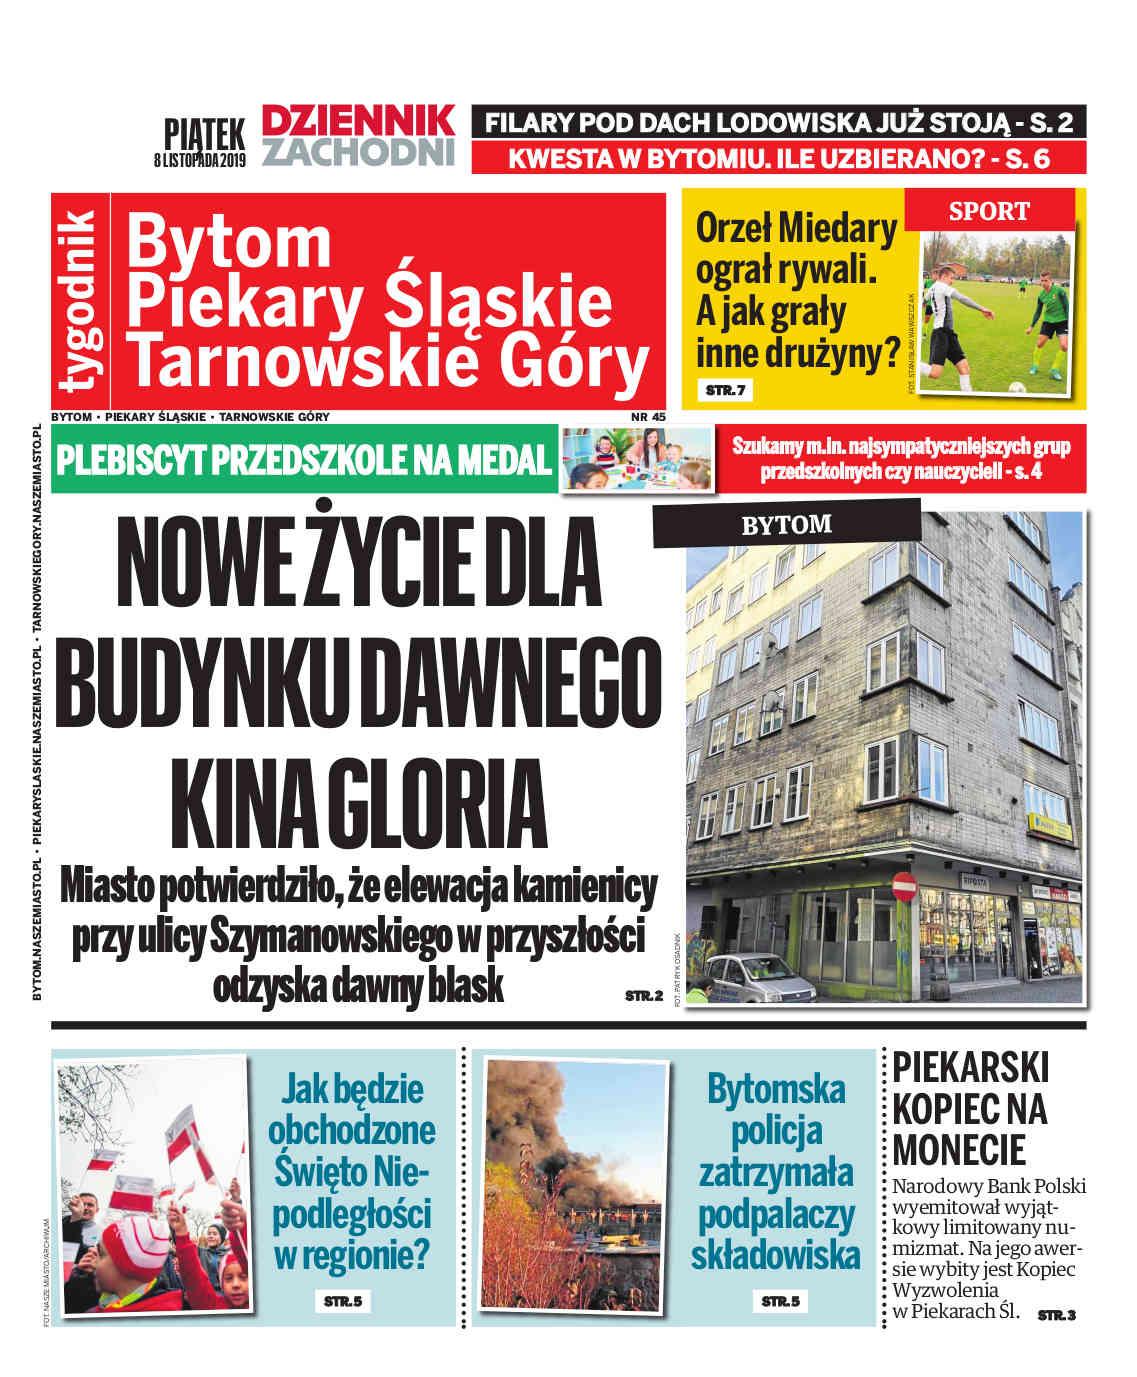 Polska Dziennik Zachodni - Bytom